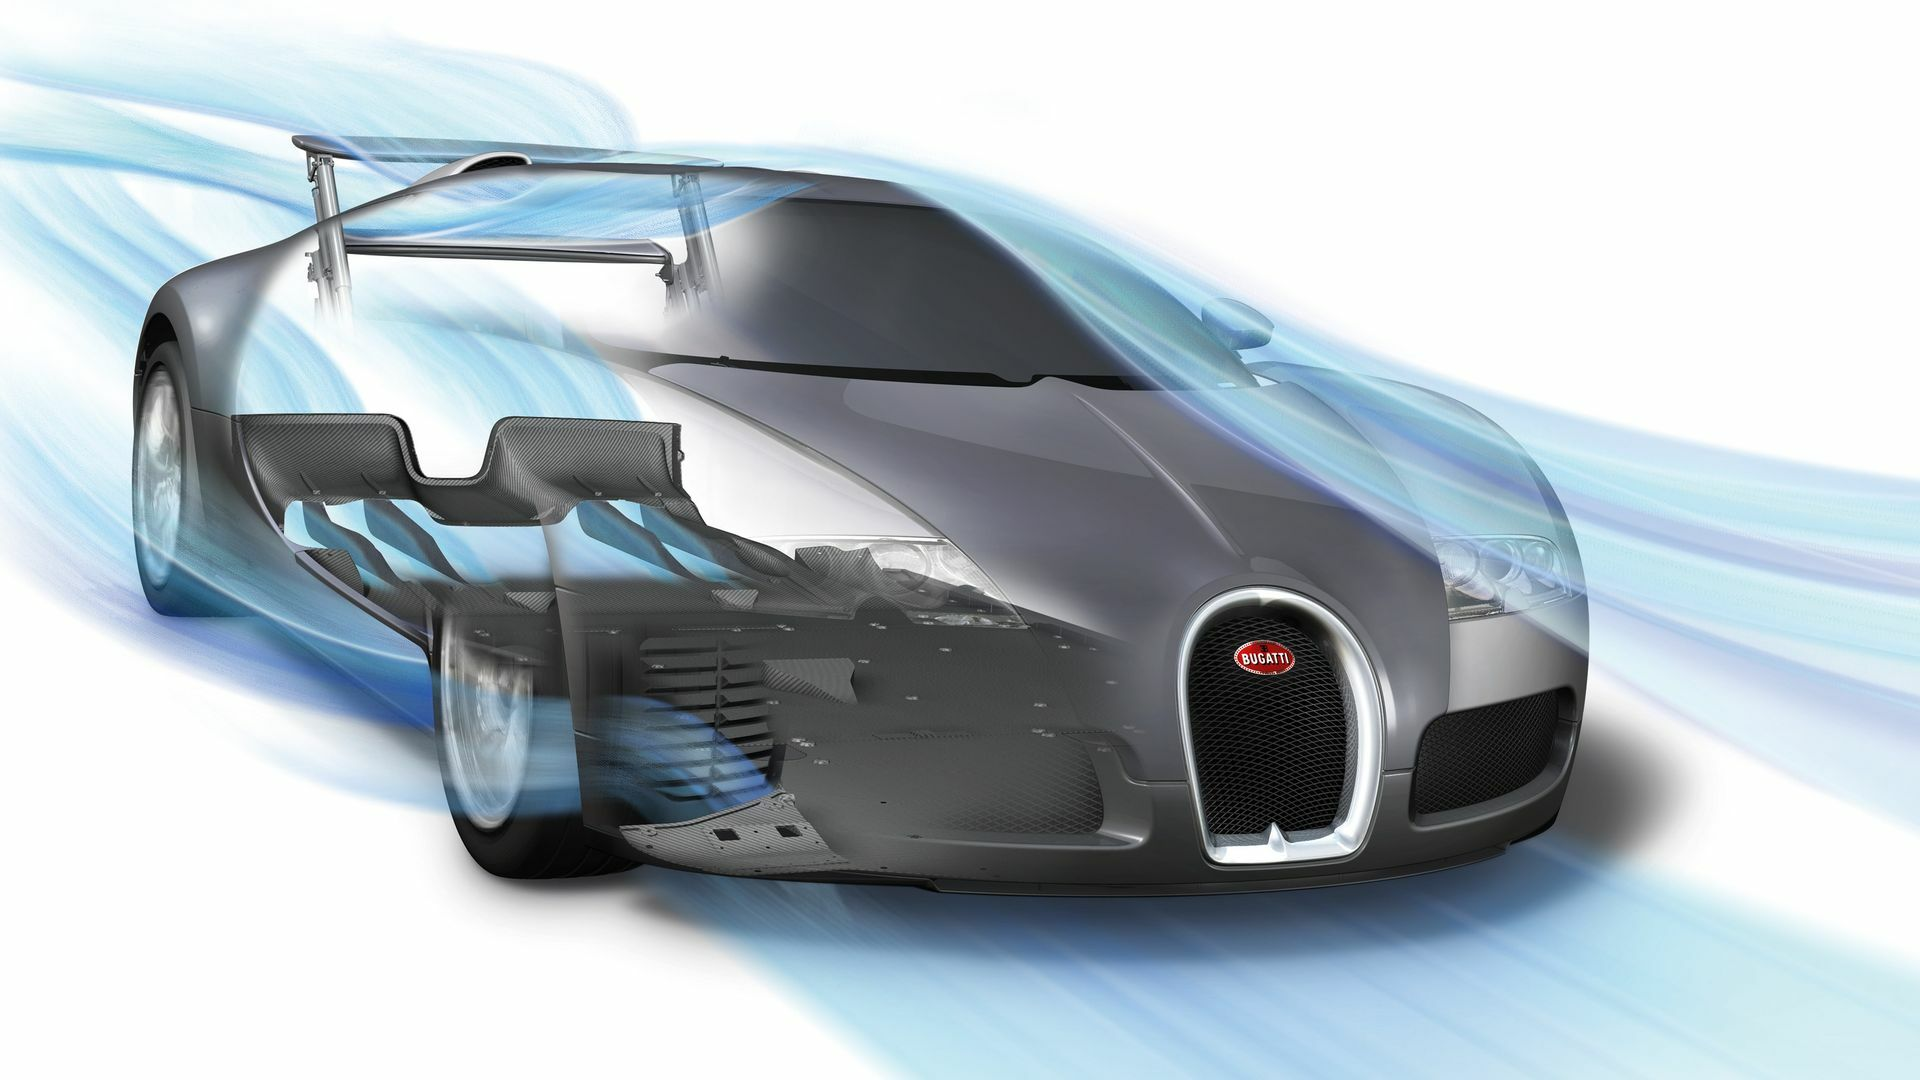 09 Bugatti Veyron aerodynamics